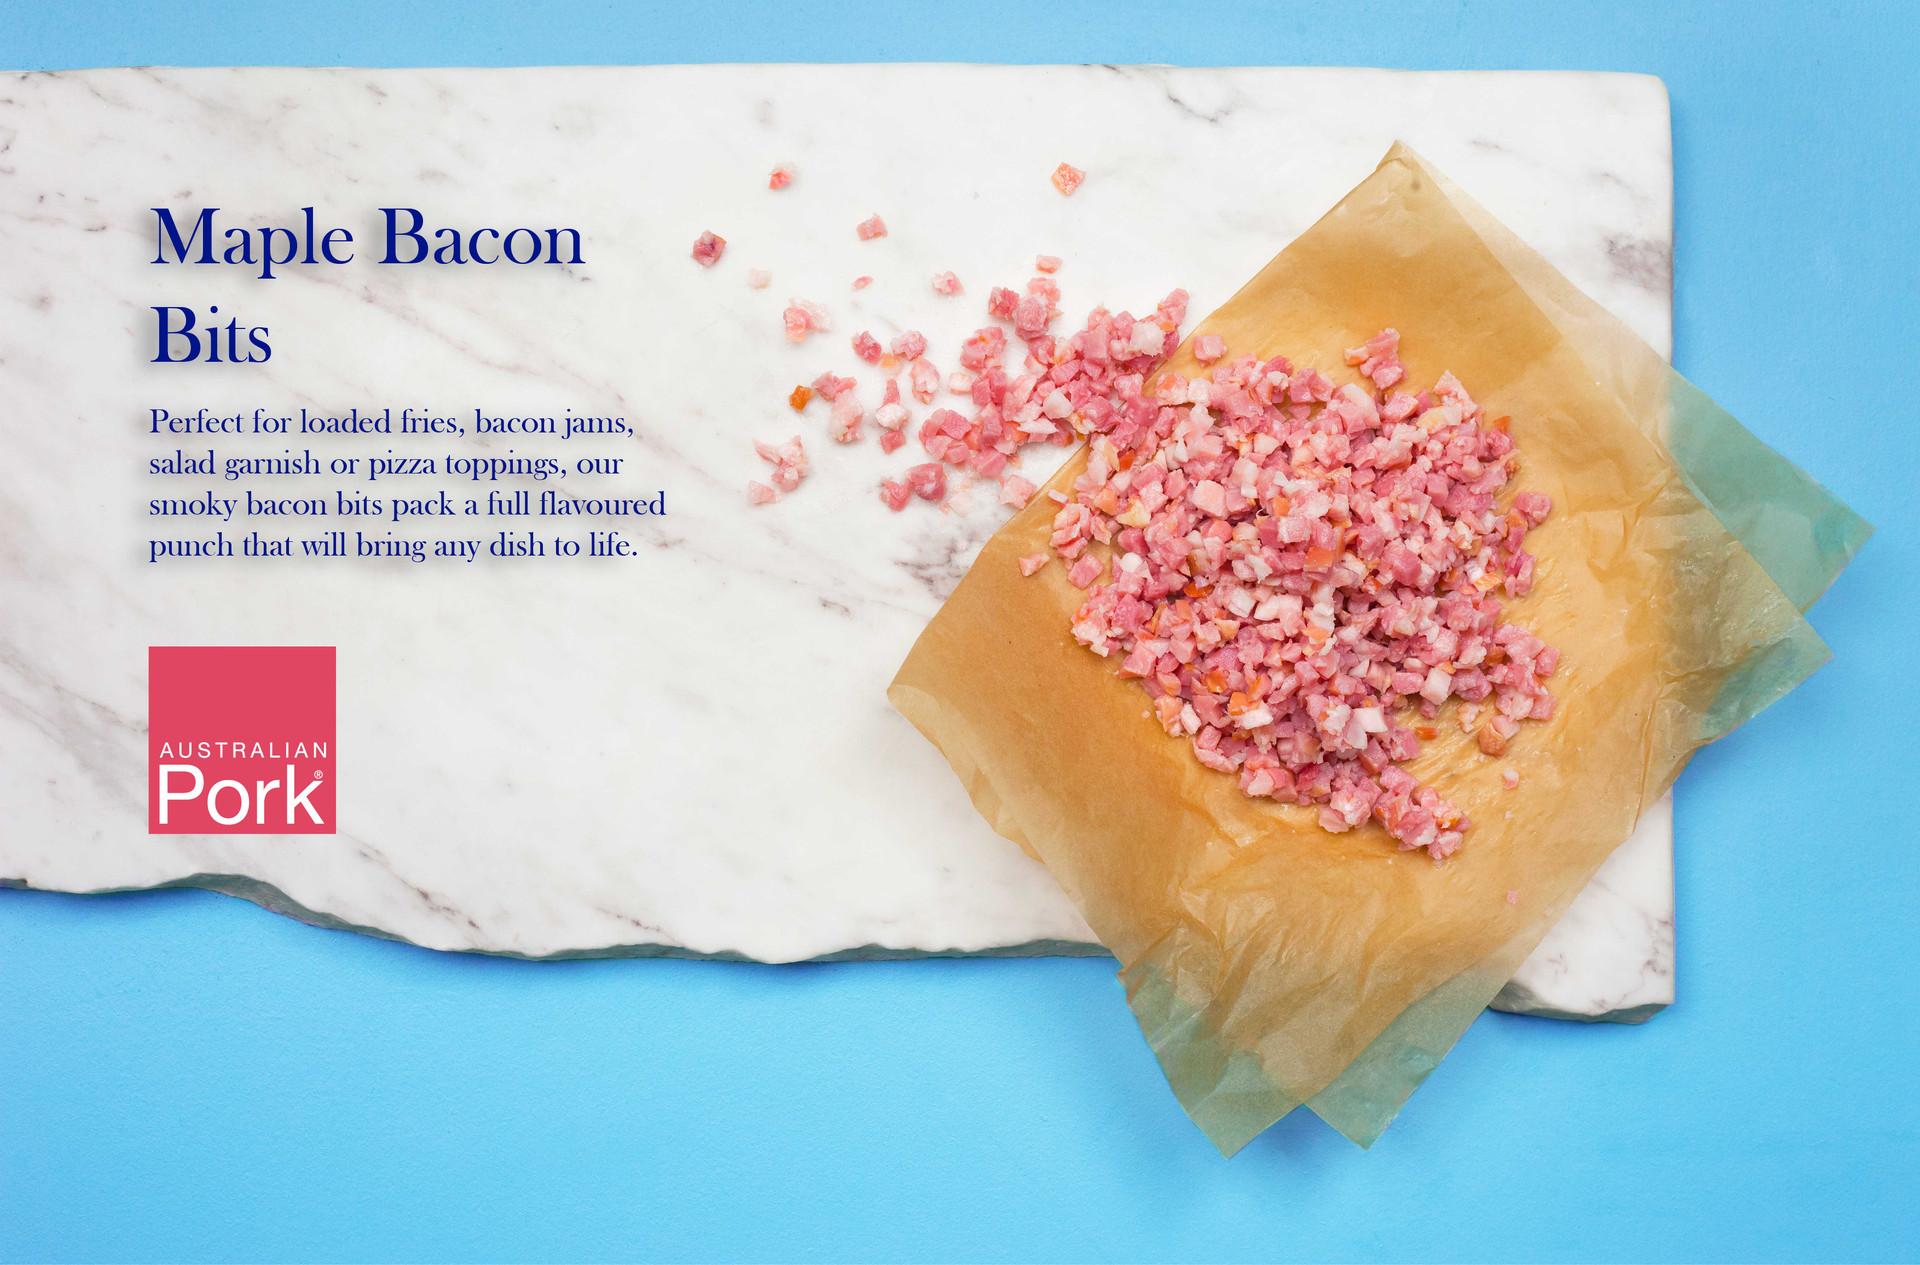 Maple Bacon Bits